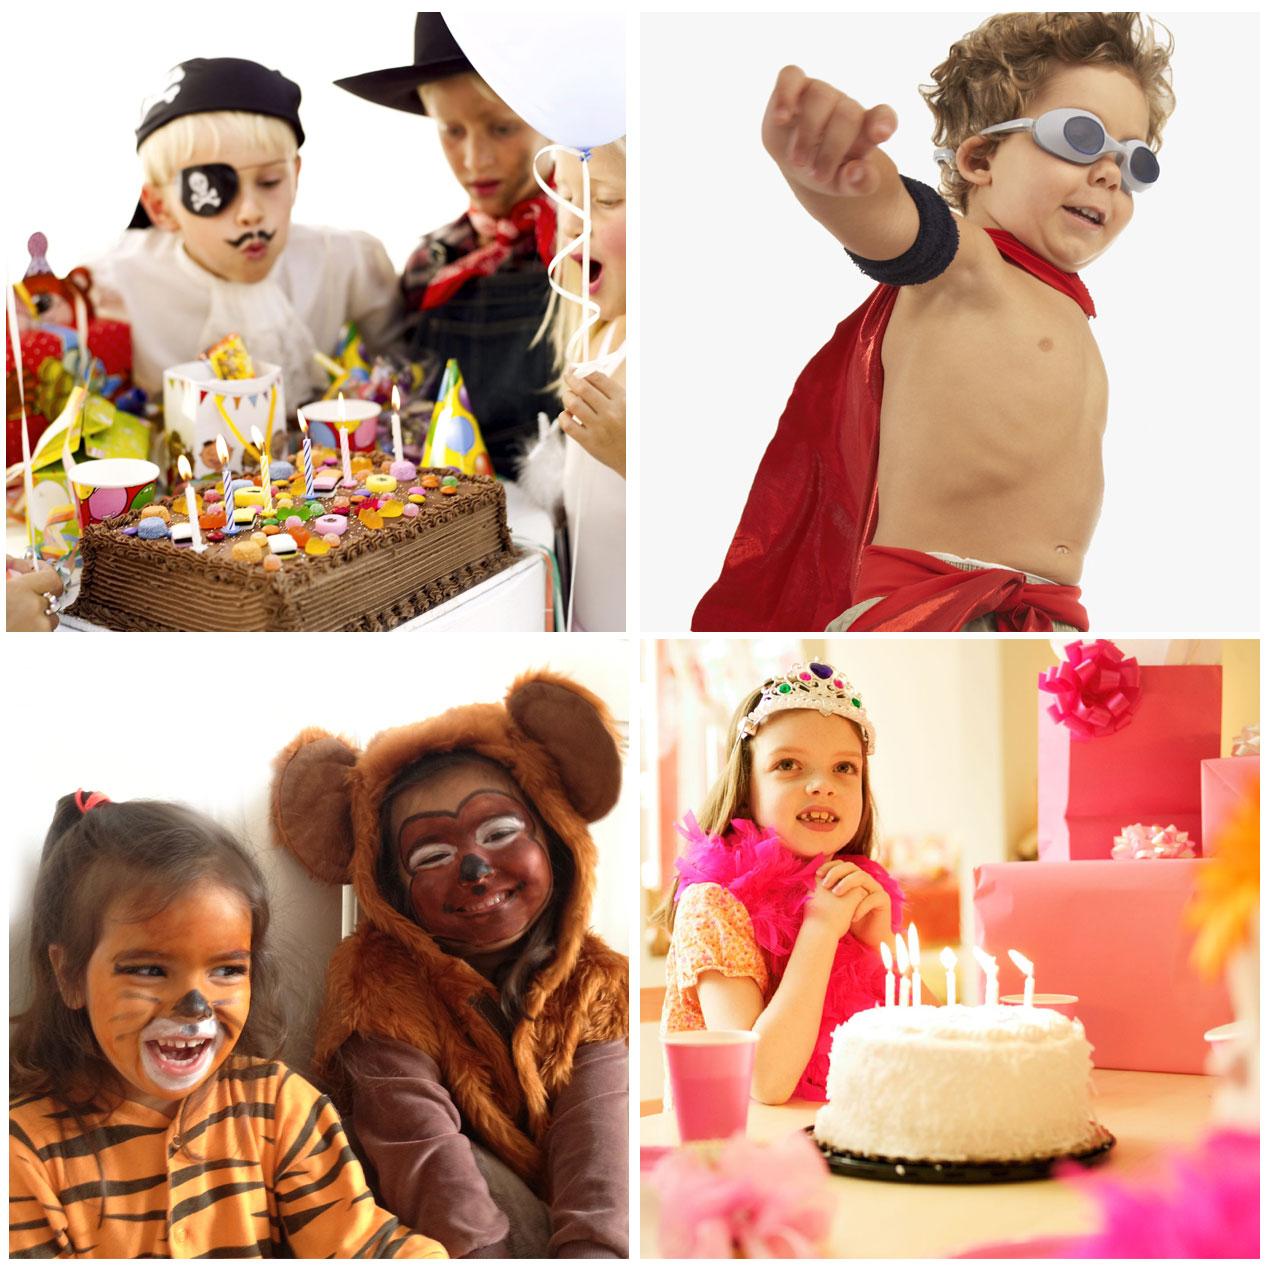 3 kindergeburtstag feiern geburtstag 3 jahre alte kinder. Black Bedroom Furniture Sets. Home Design Ideas